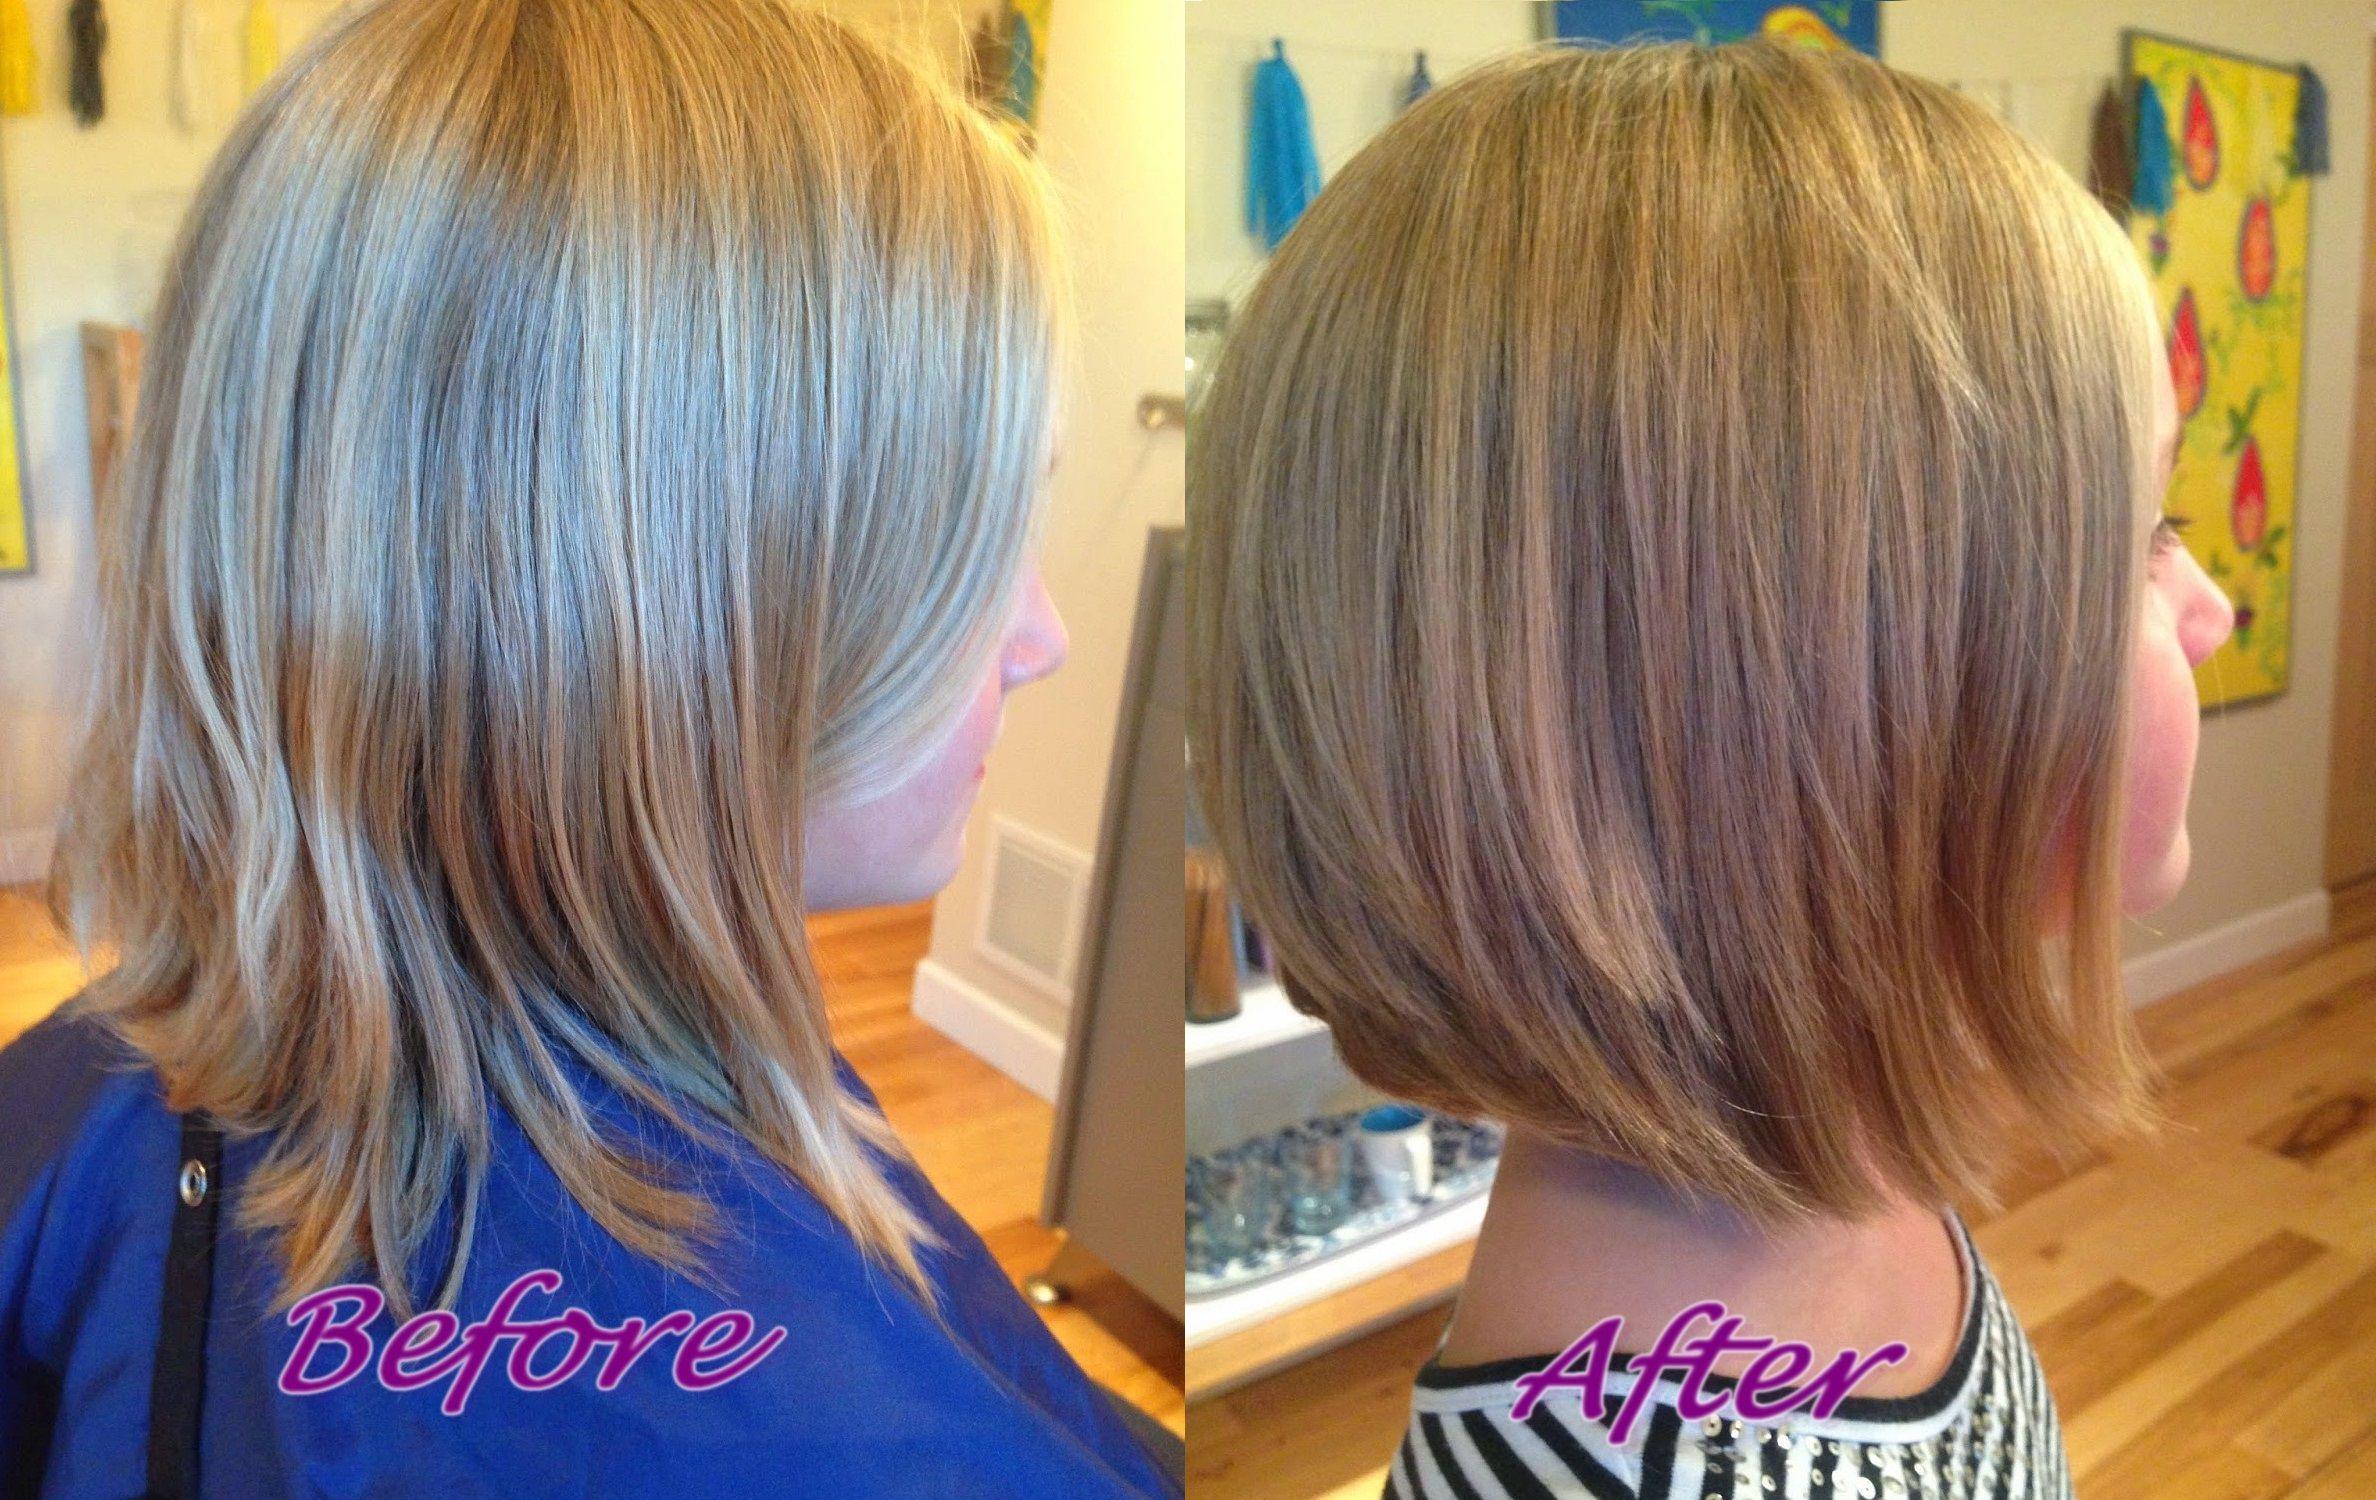 Épinglé par Rya Ryo sur Hair makeover for young girls